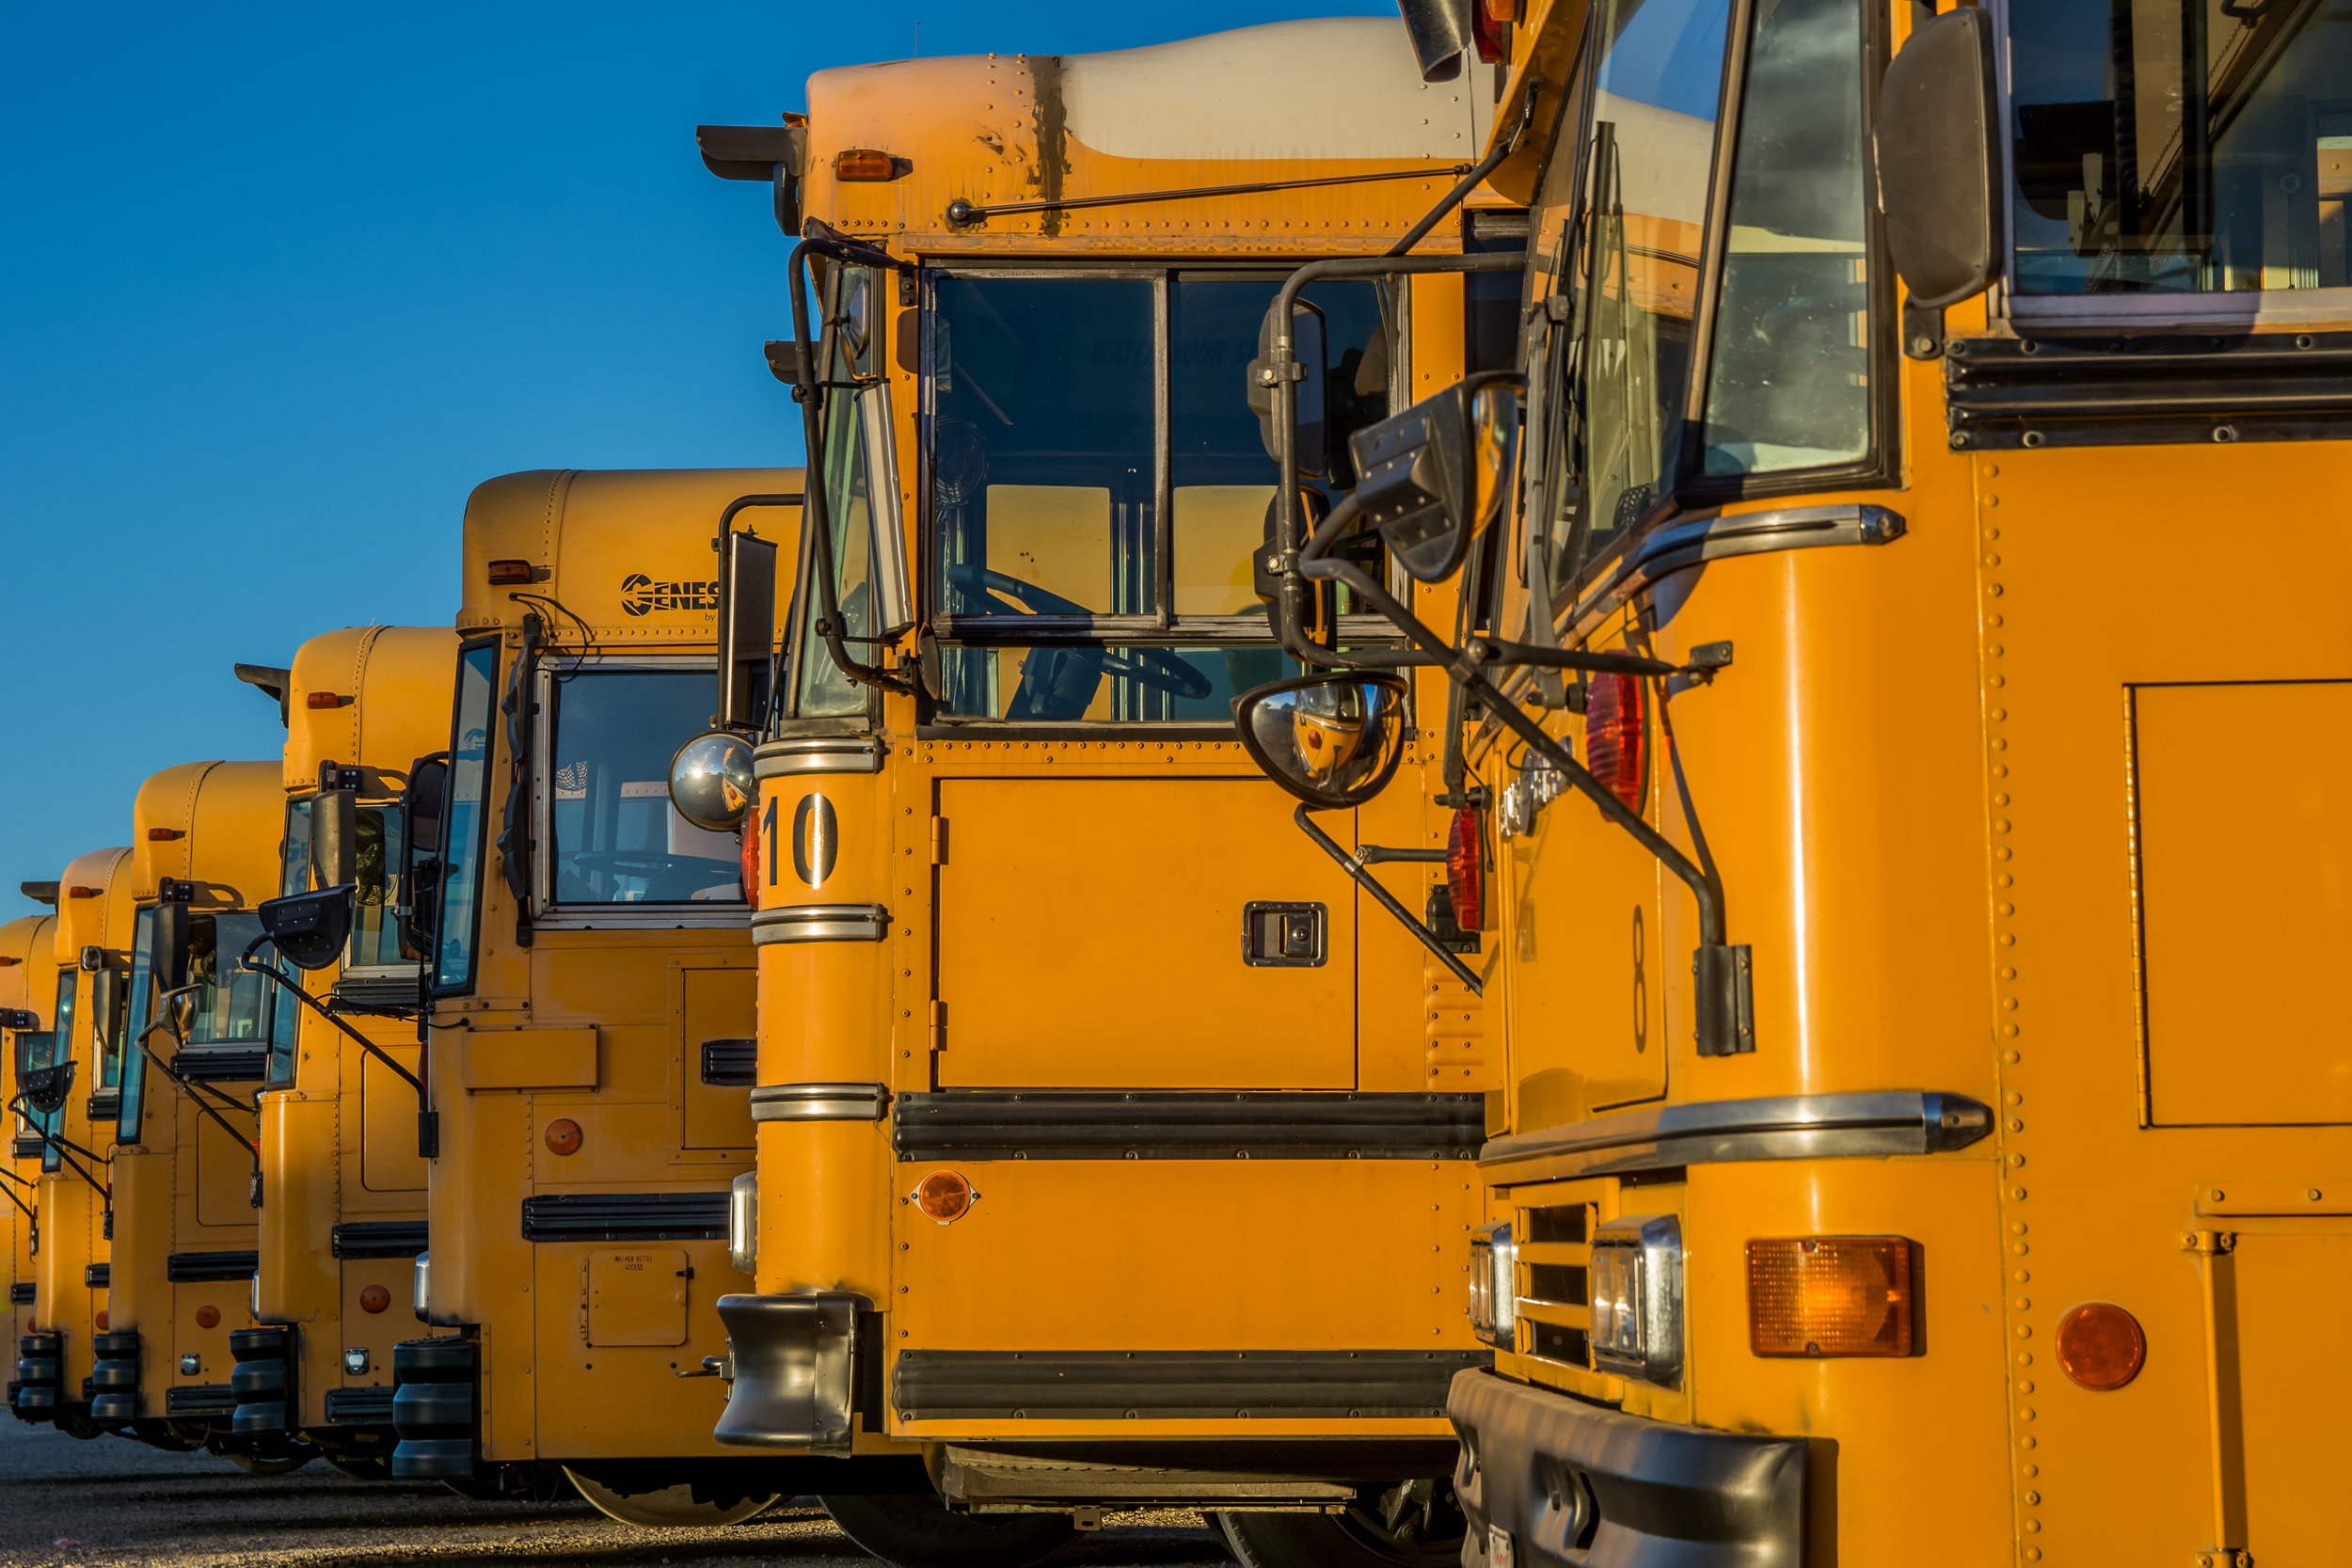 Alleghany County Public Schools - Learn More >